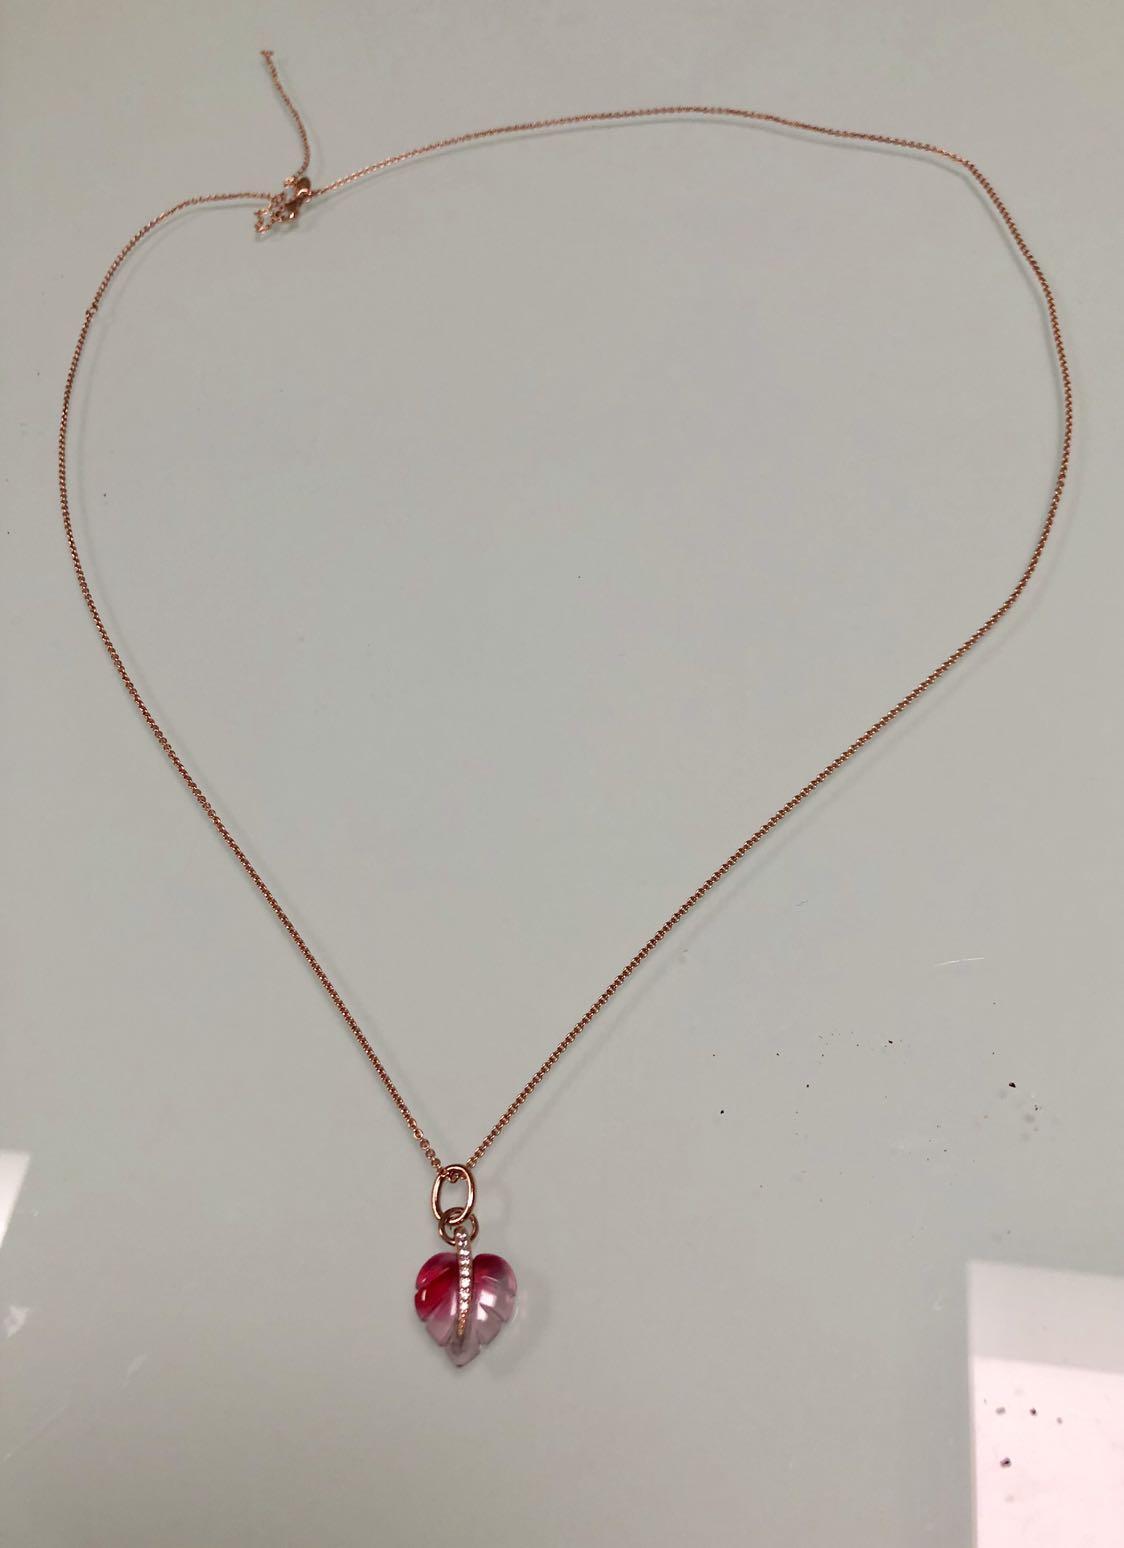 Pandora rose adjustable 90cm classic cable chain necklace